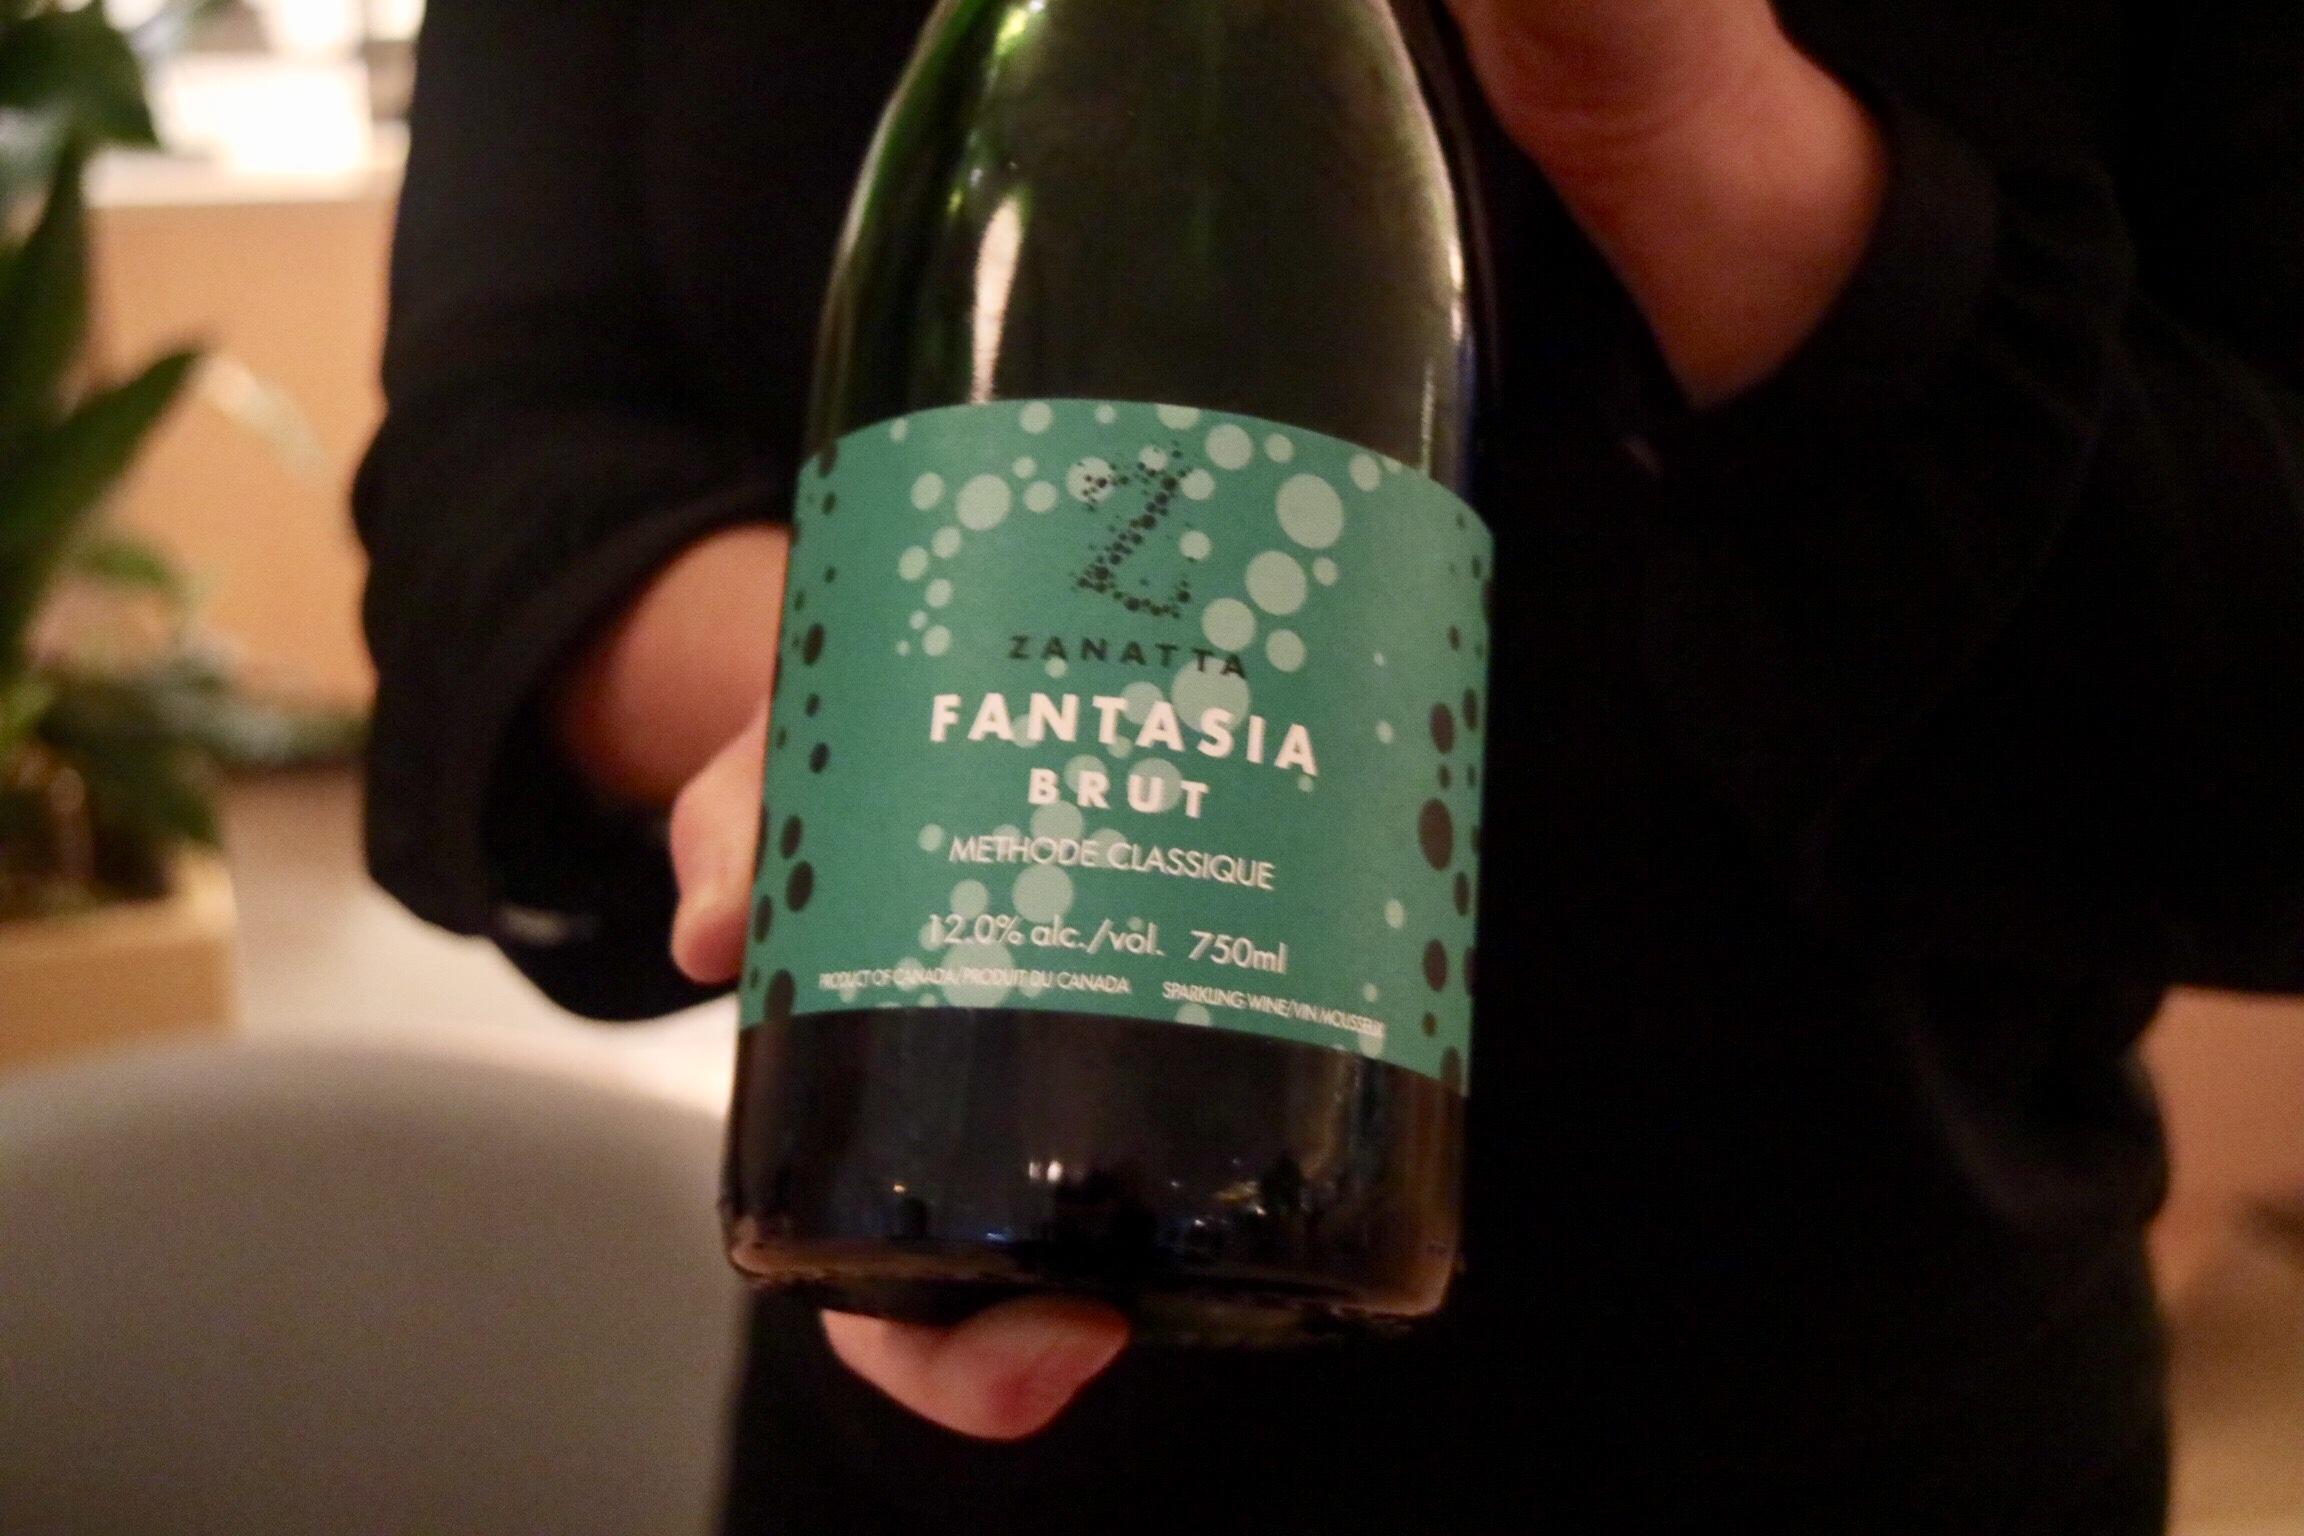 Zanatta Fantasia Brut